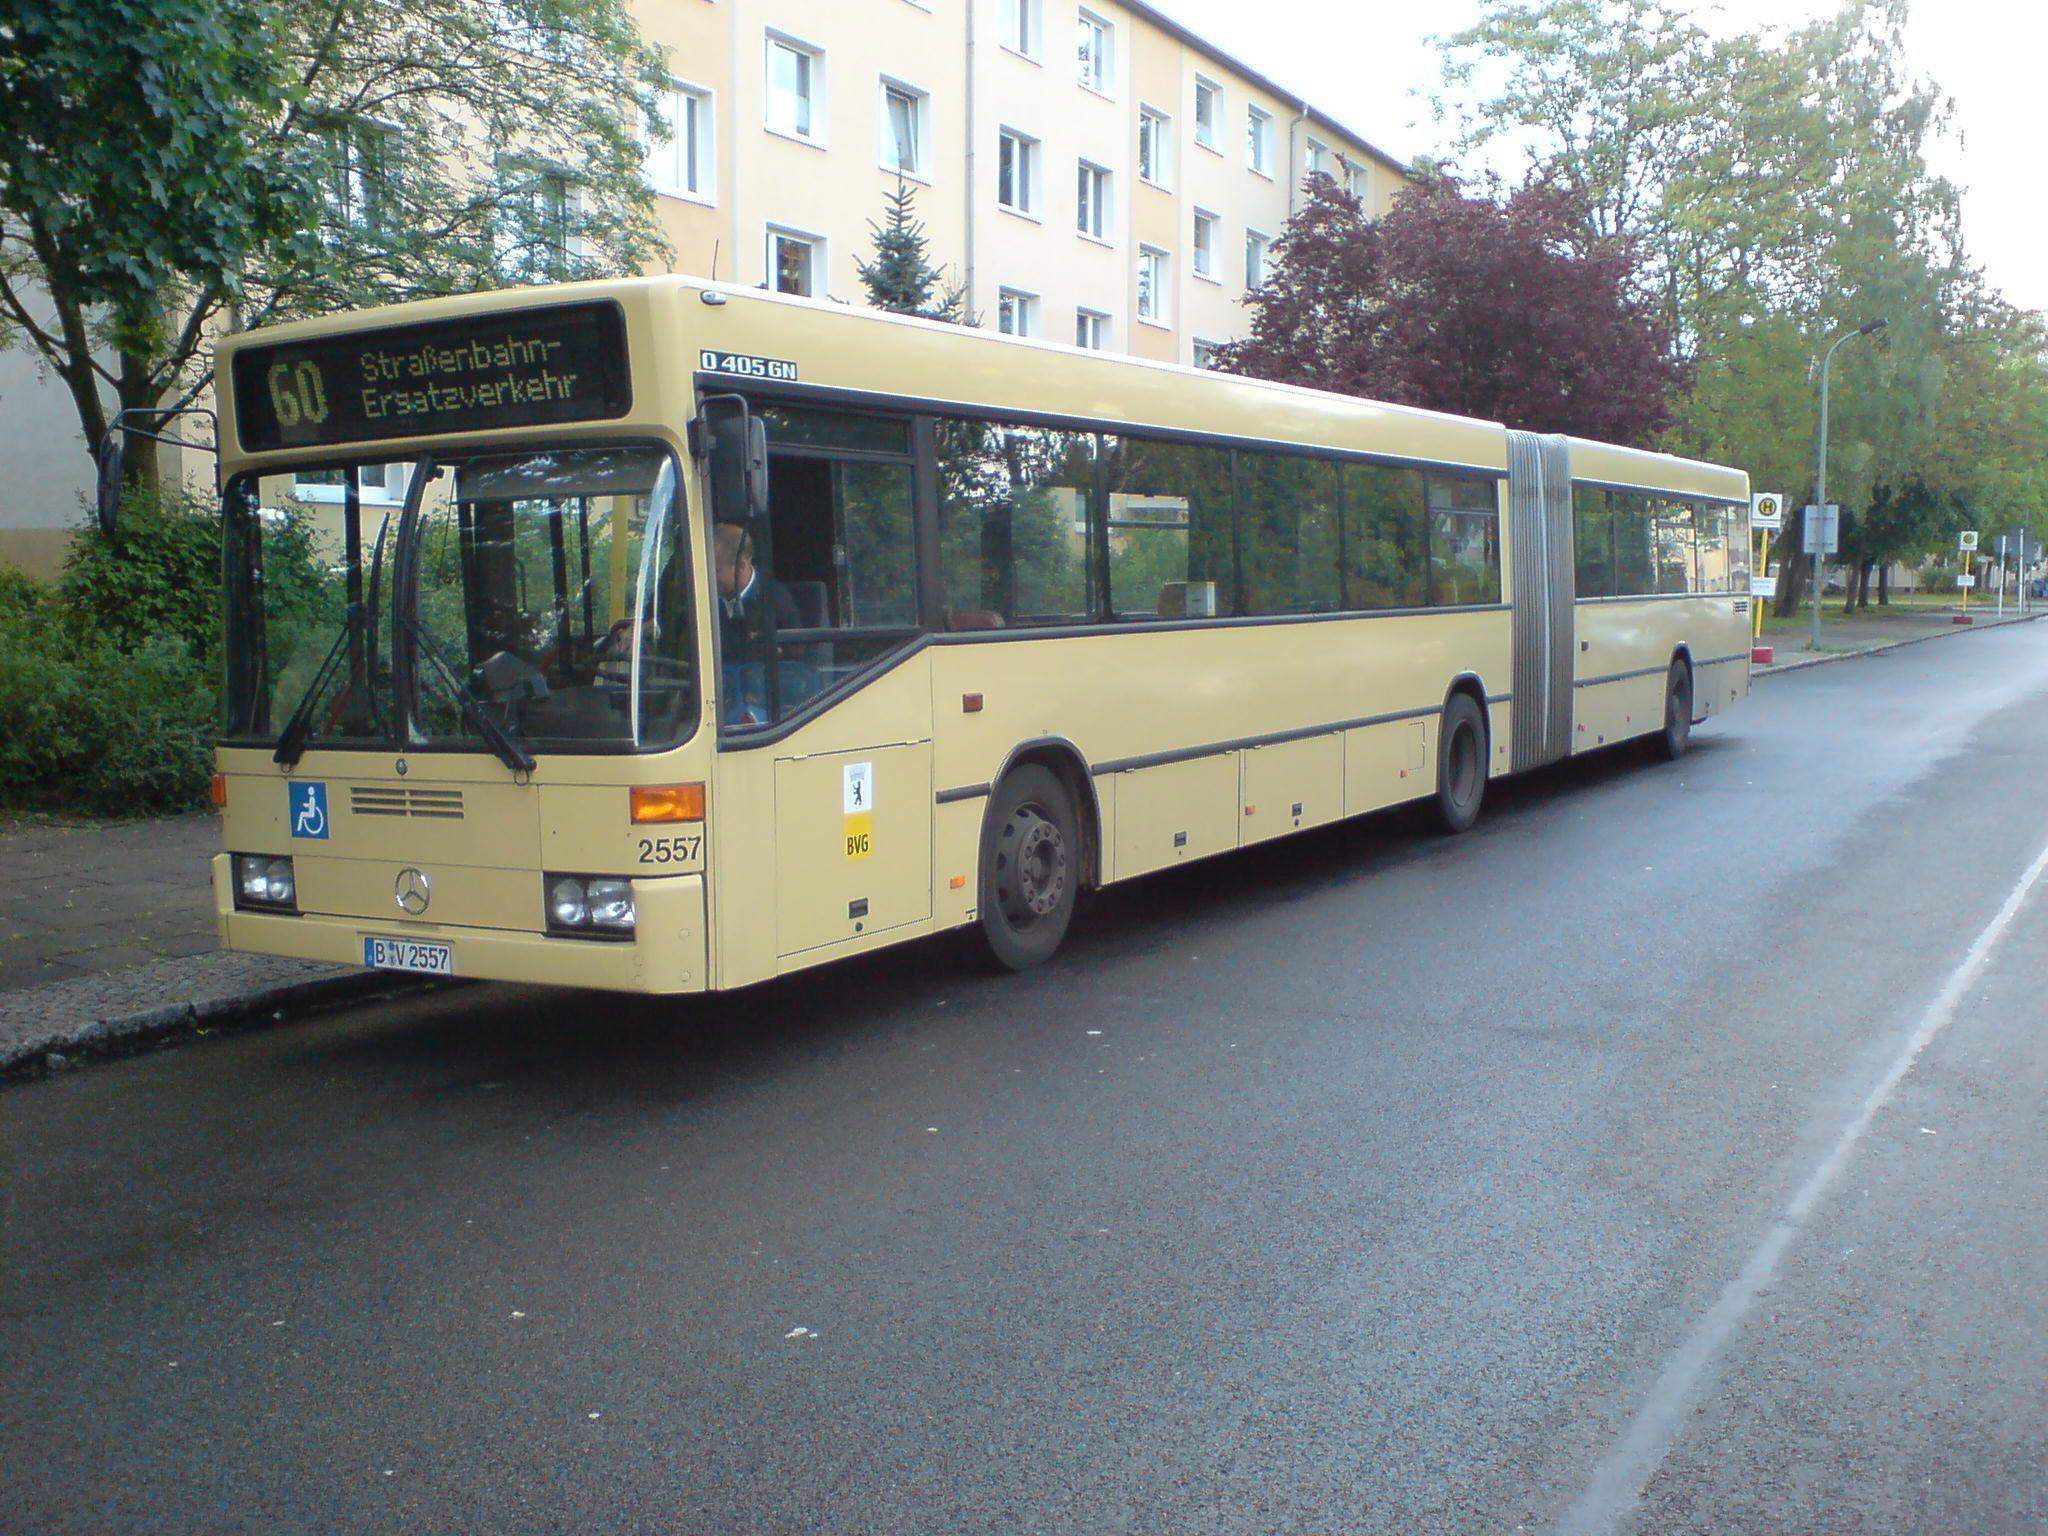 Bus 2557, Köpenick, 2007;